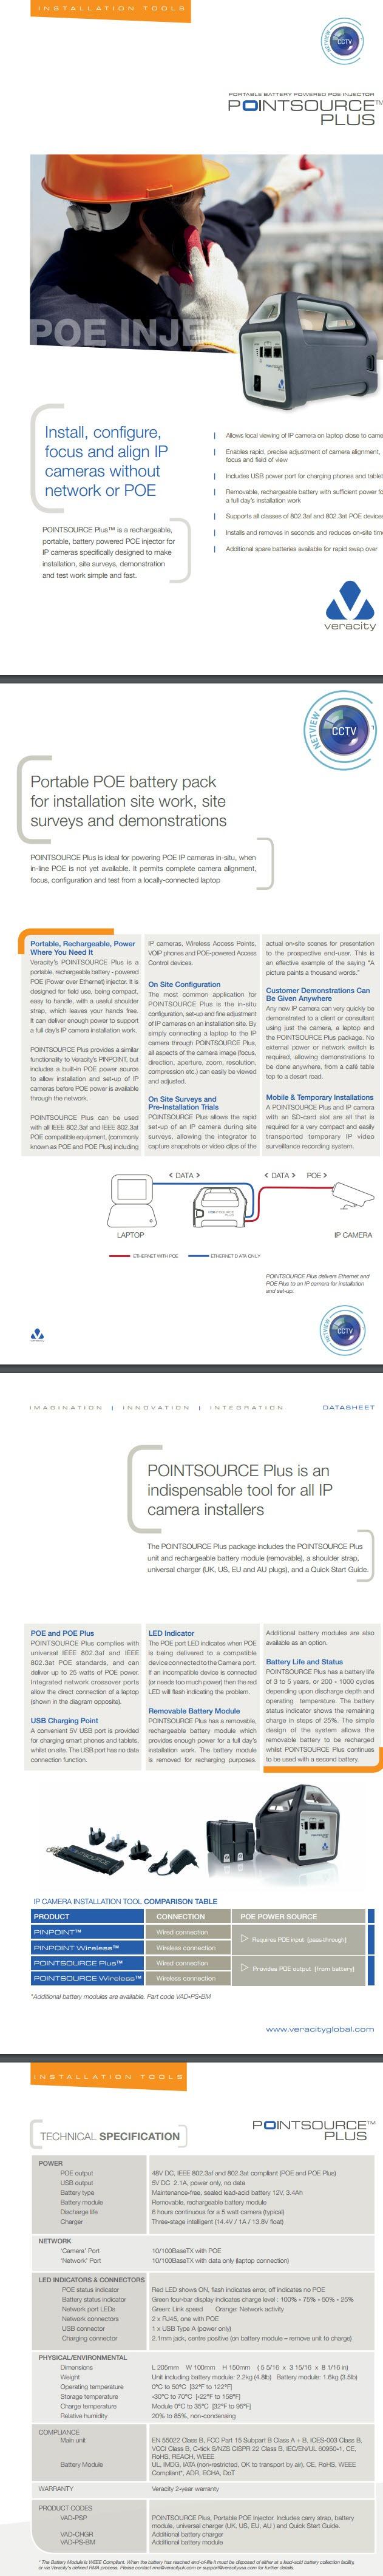 Veracity Pointsource Plus Datasheet